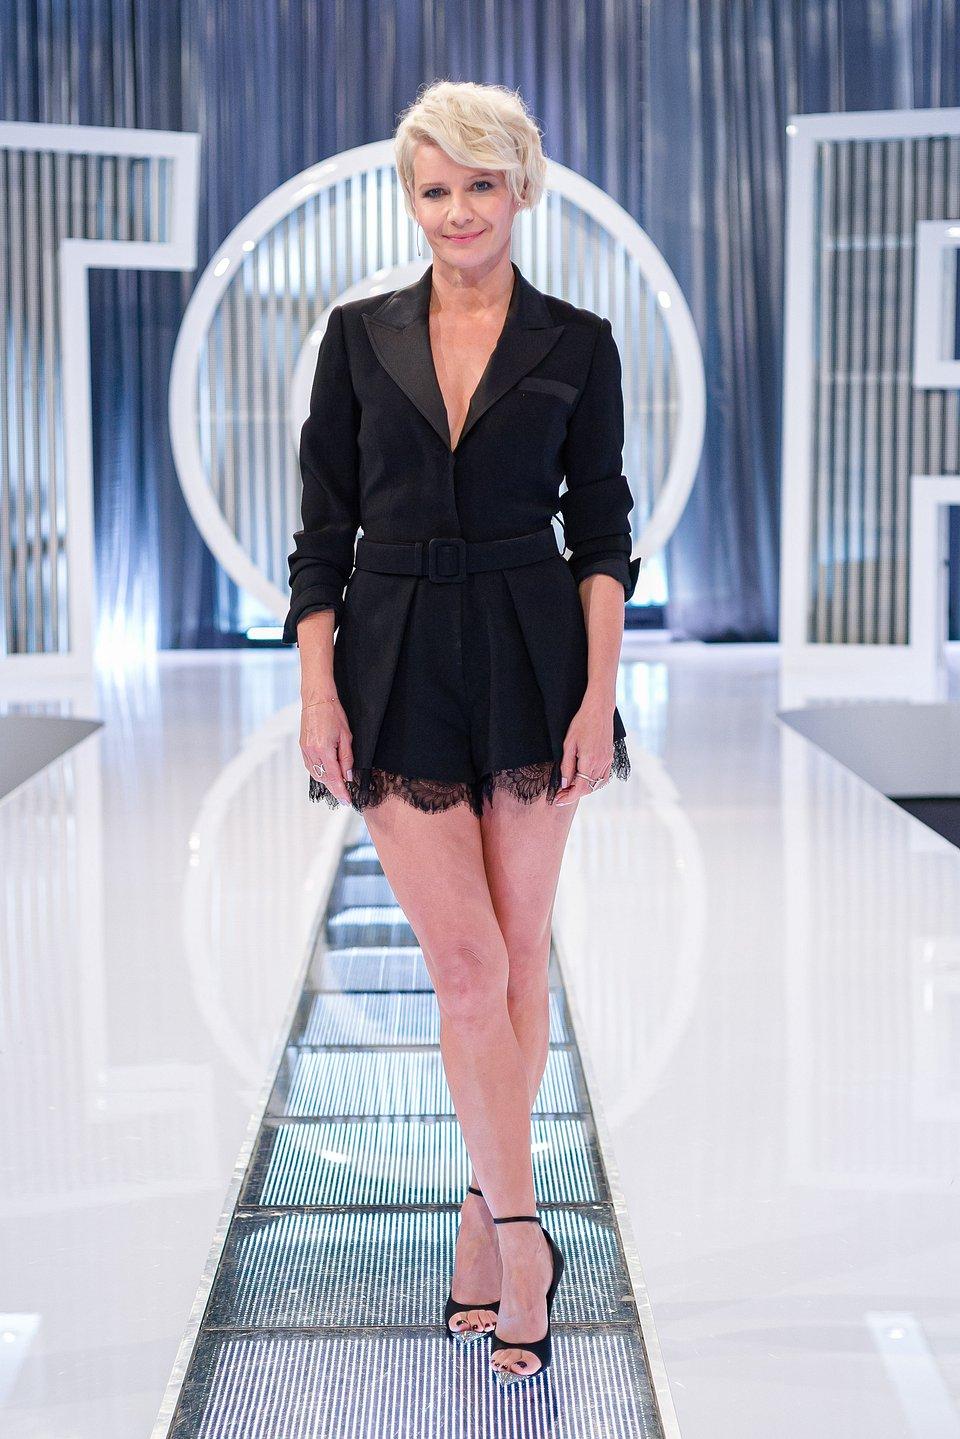 Małgorzata Kożuchowska, fot.: TVN/ Tomasz Urbanek